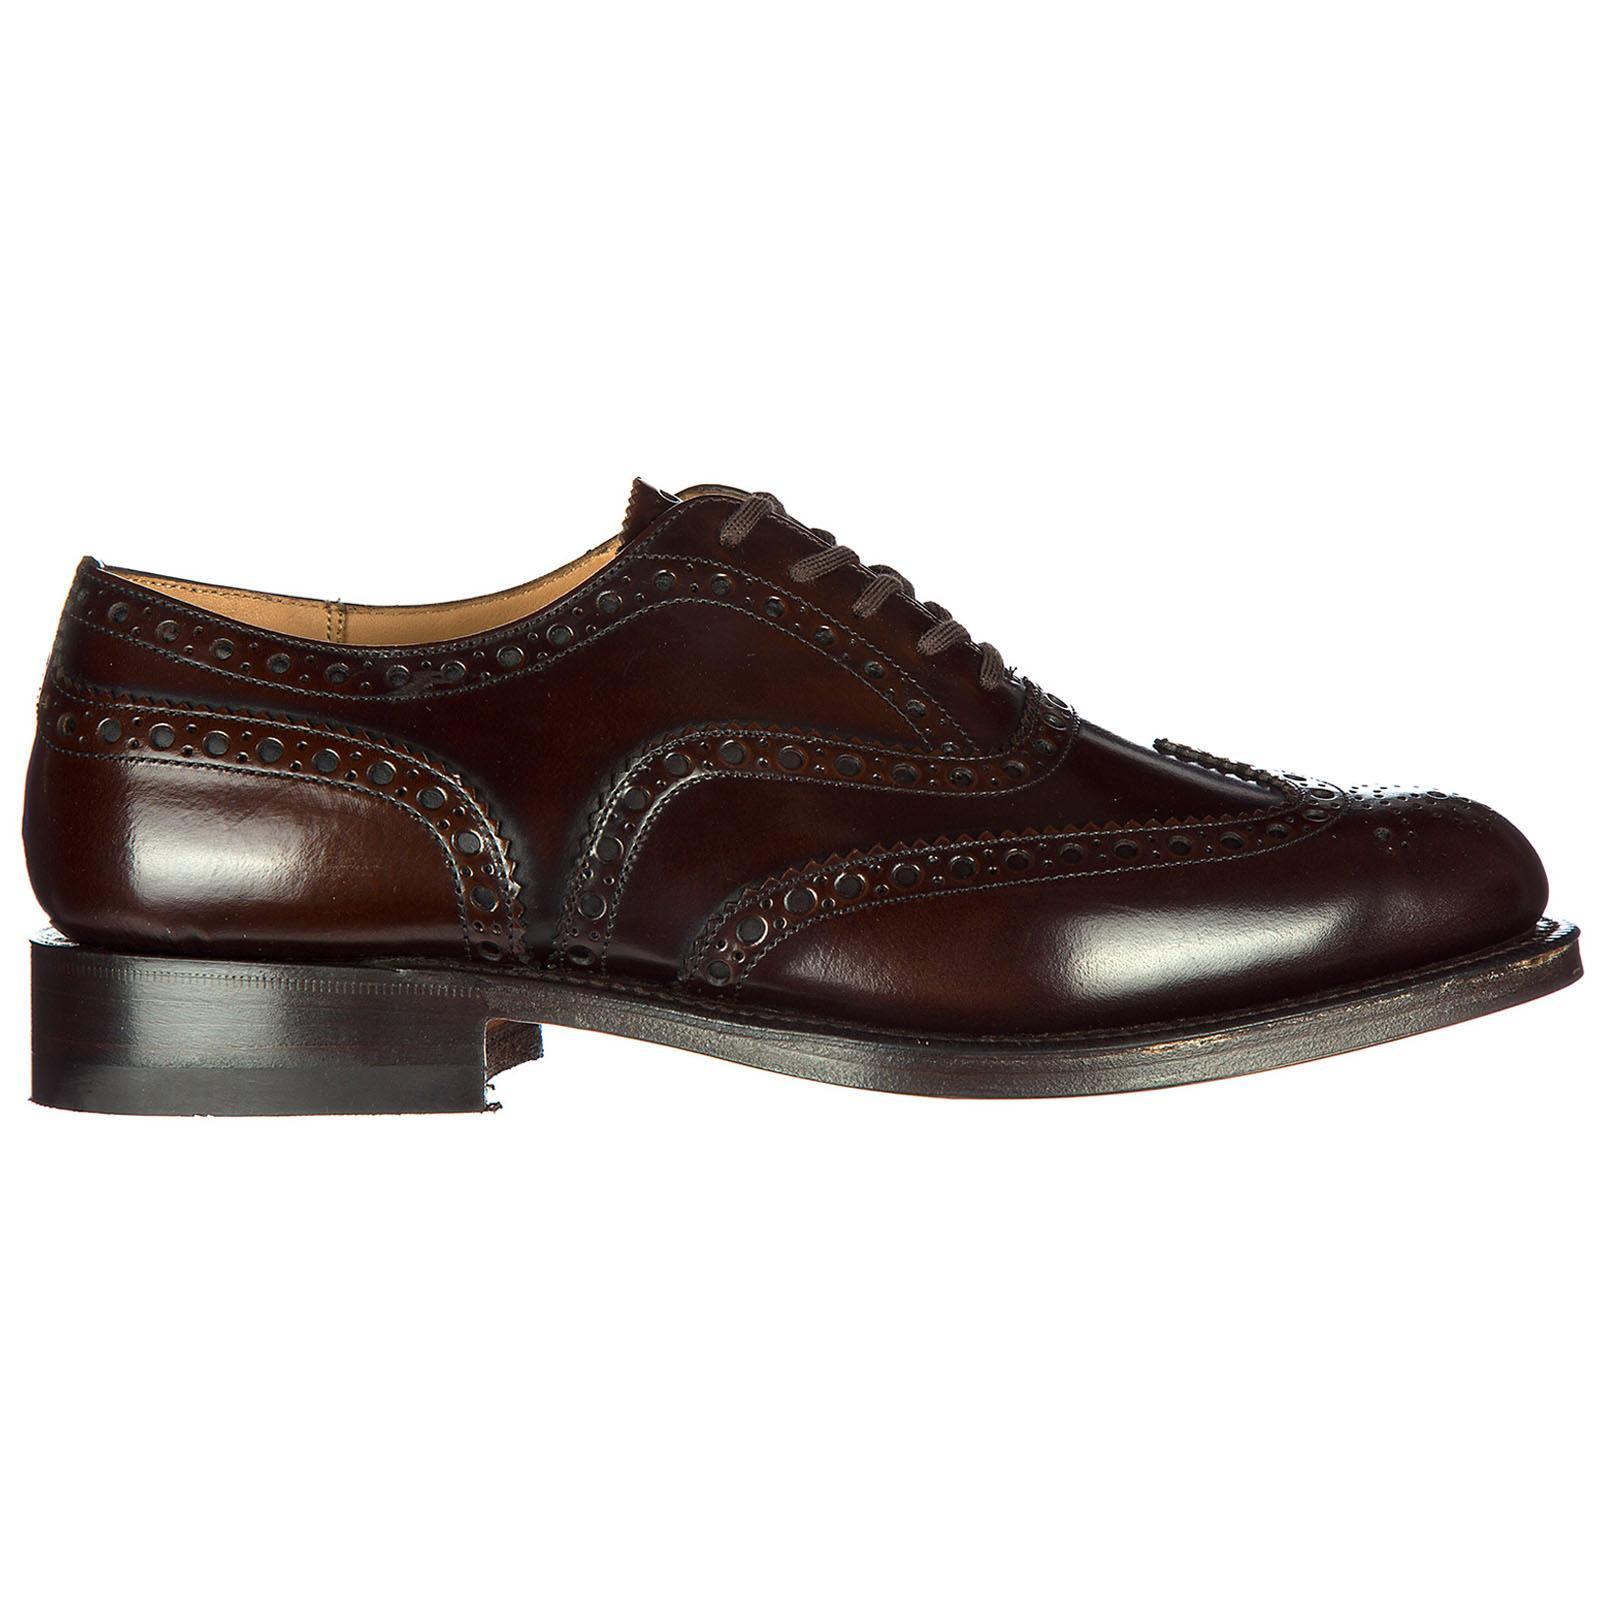 Herrenschuhe Leder Herren Business Schuhe Schnürschuhe Brogue Burwood in Brown